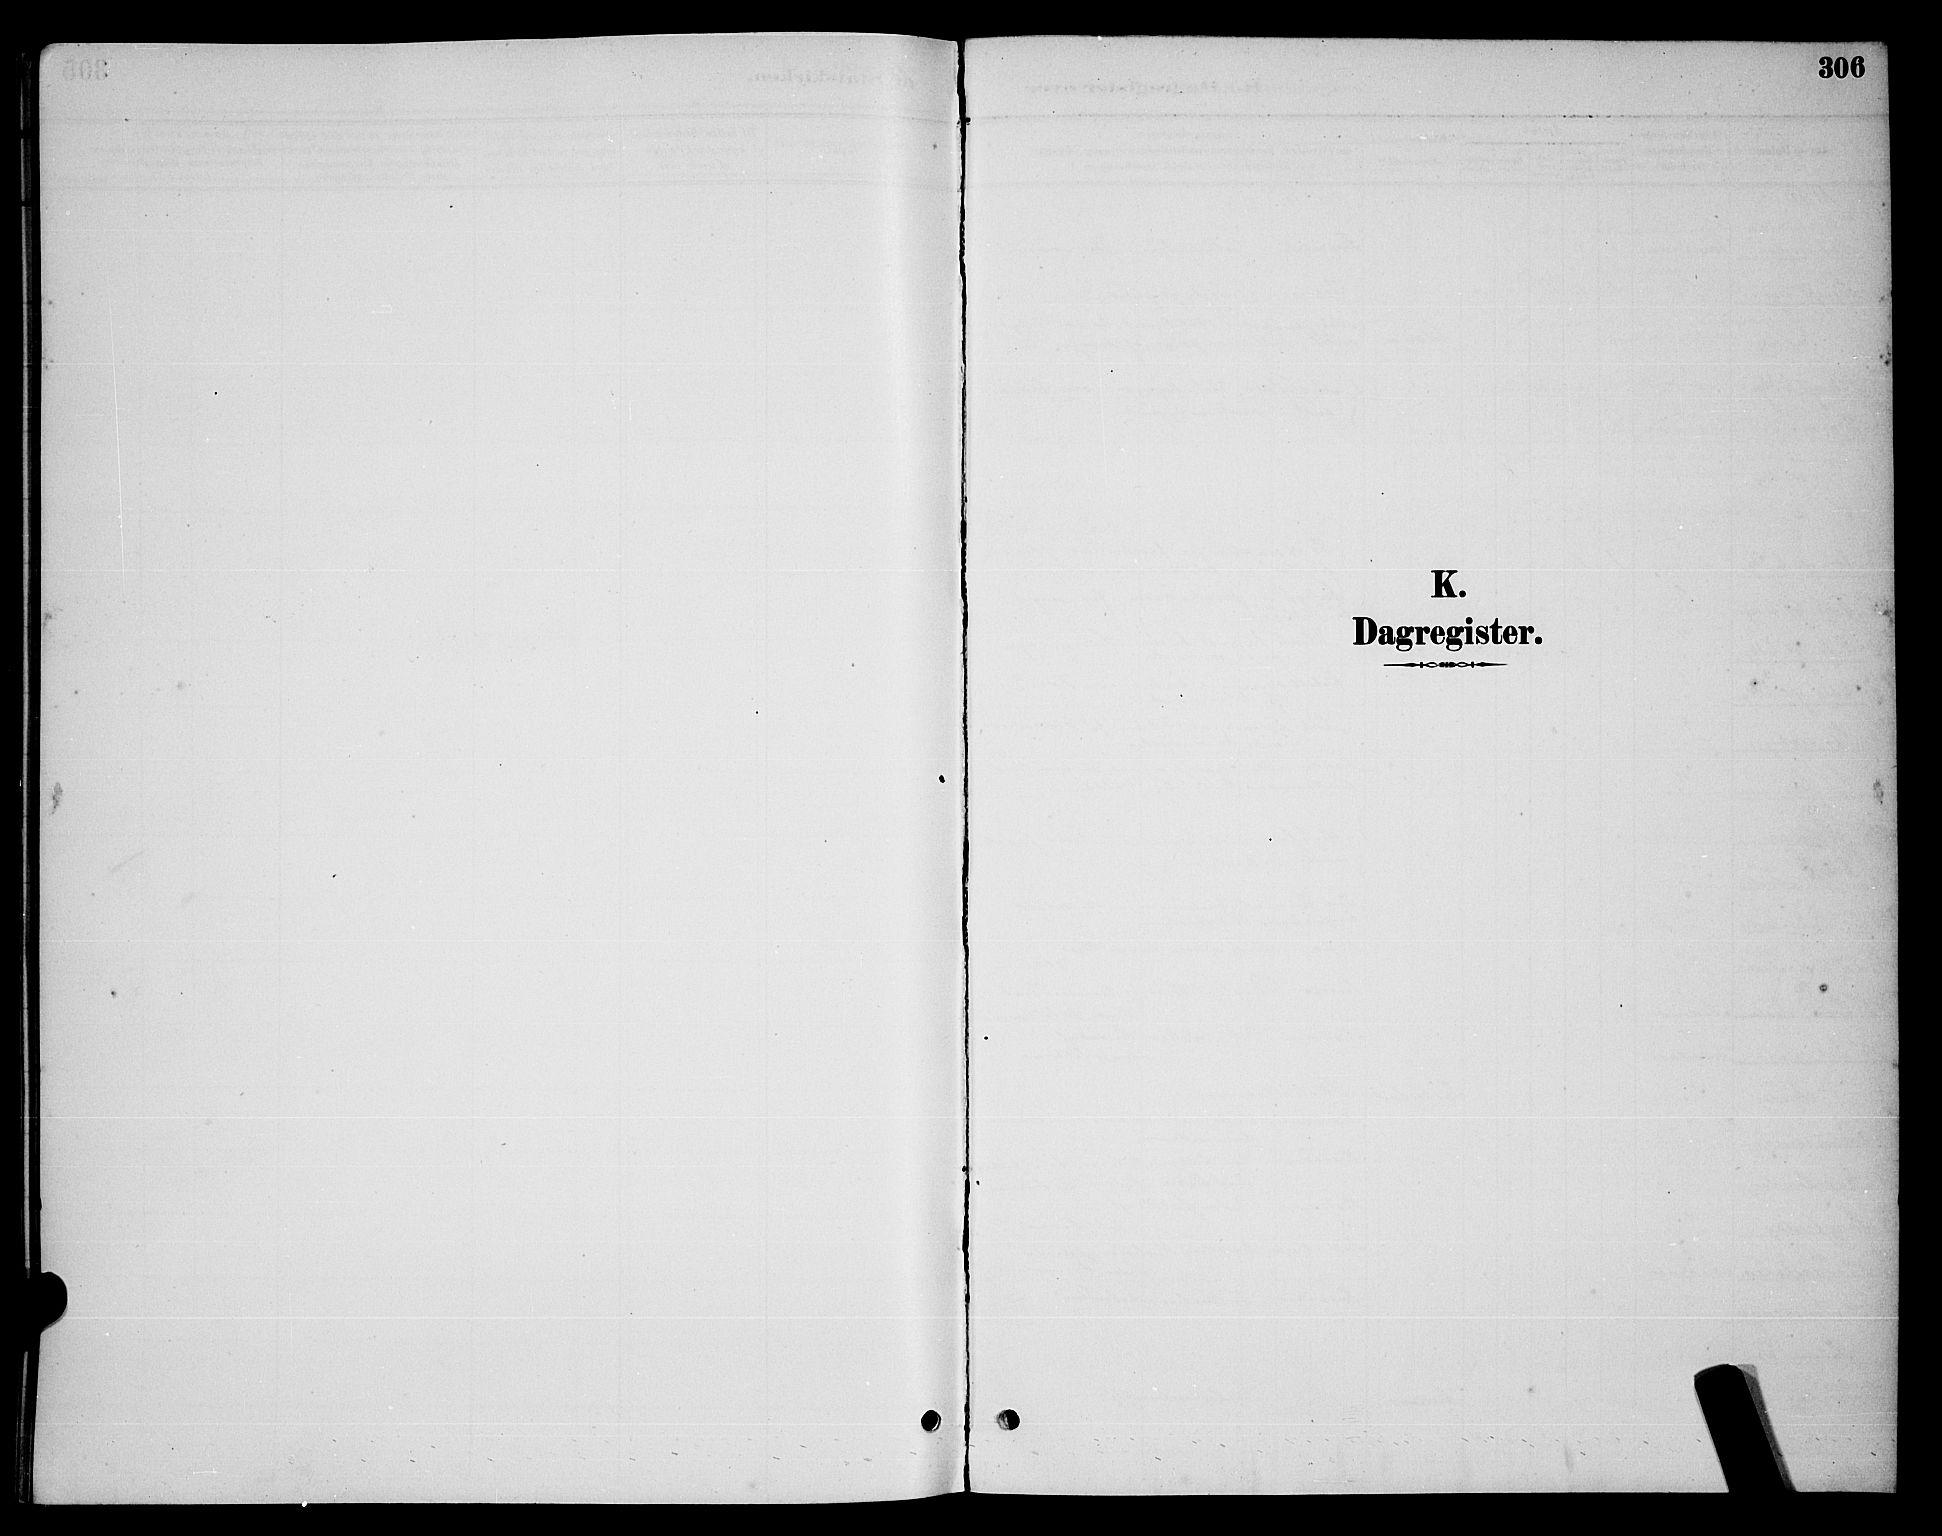 SAT, Ministerialprotokoller, klokkerbøker og fødselsregistre - Nordland, 863/L0914: Klokkerbok nr. 863C04, 1886-1897, s. 306